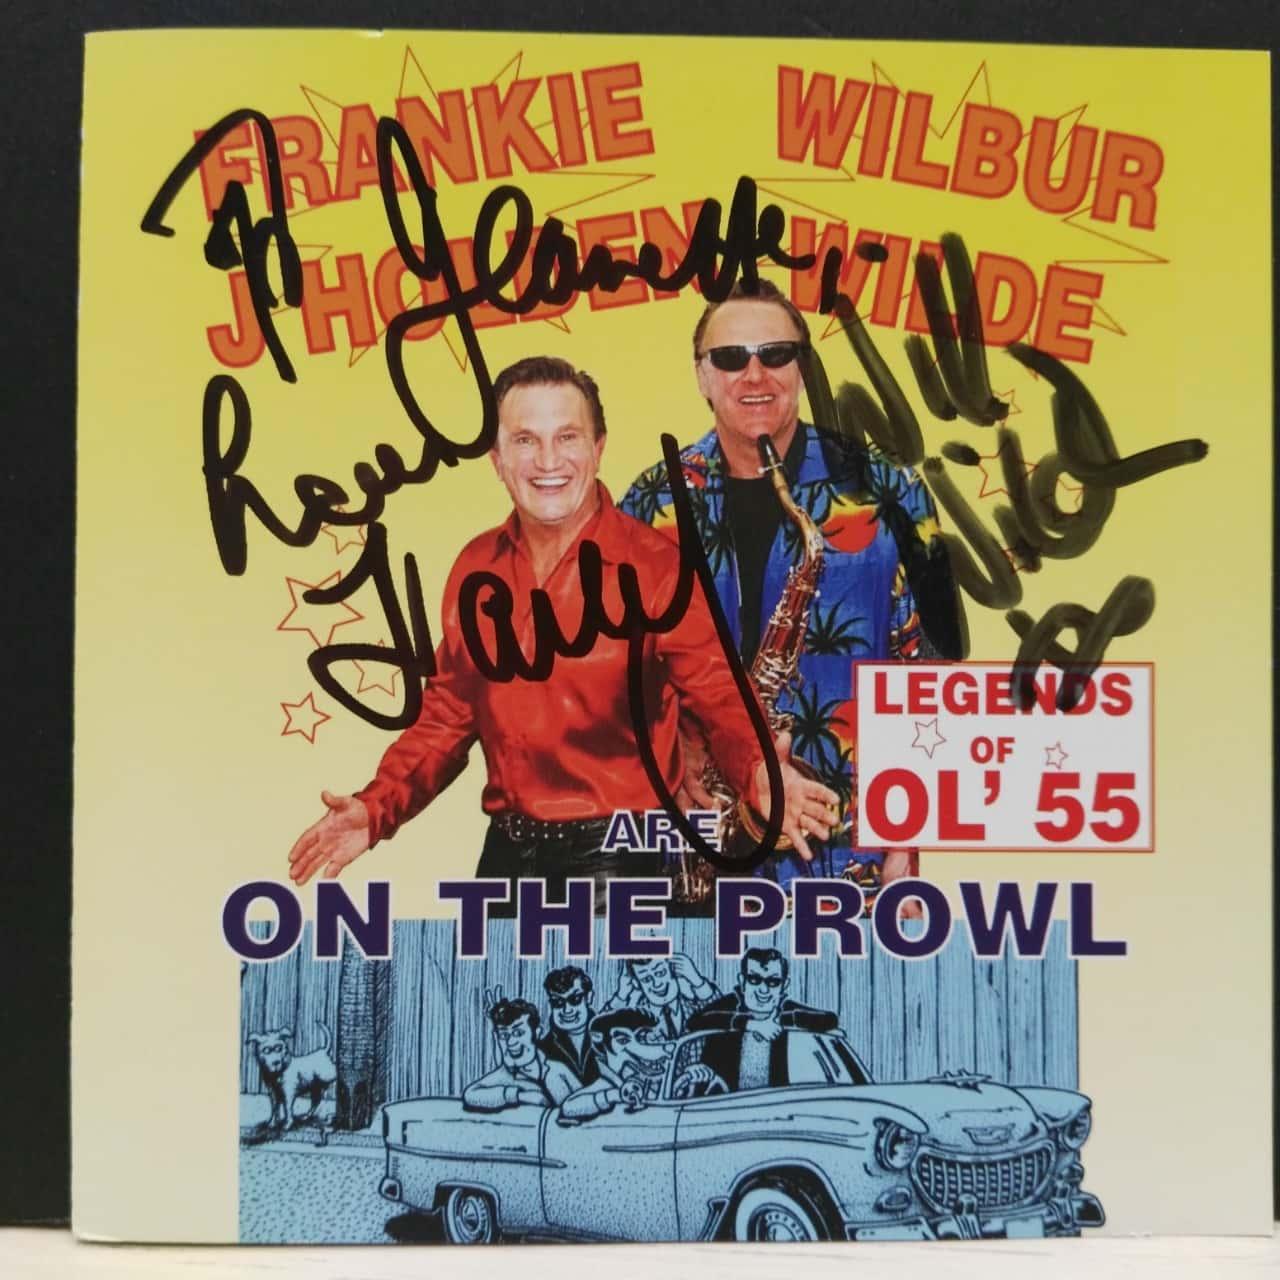 Music CD by Frankie J Holden & Wilbur Wilde